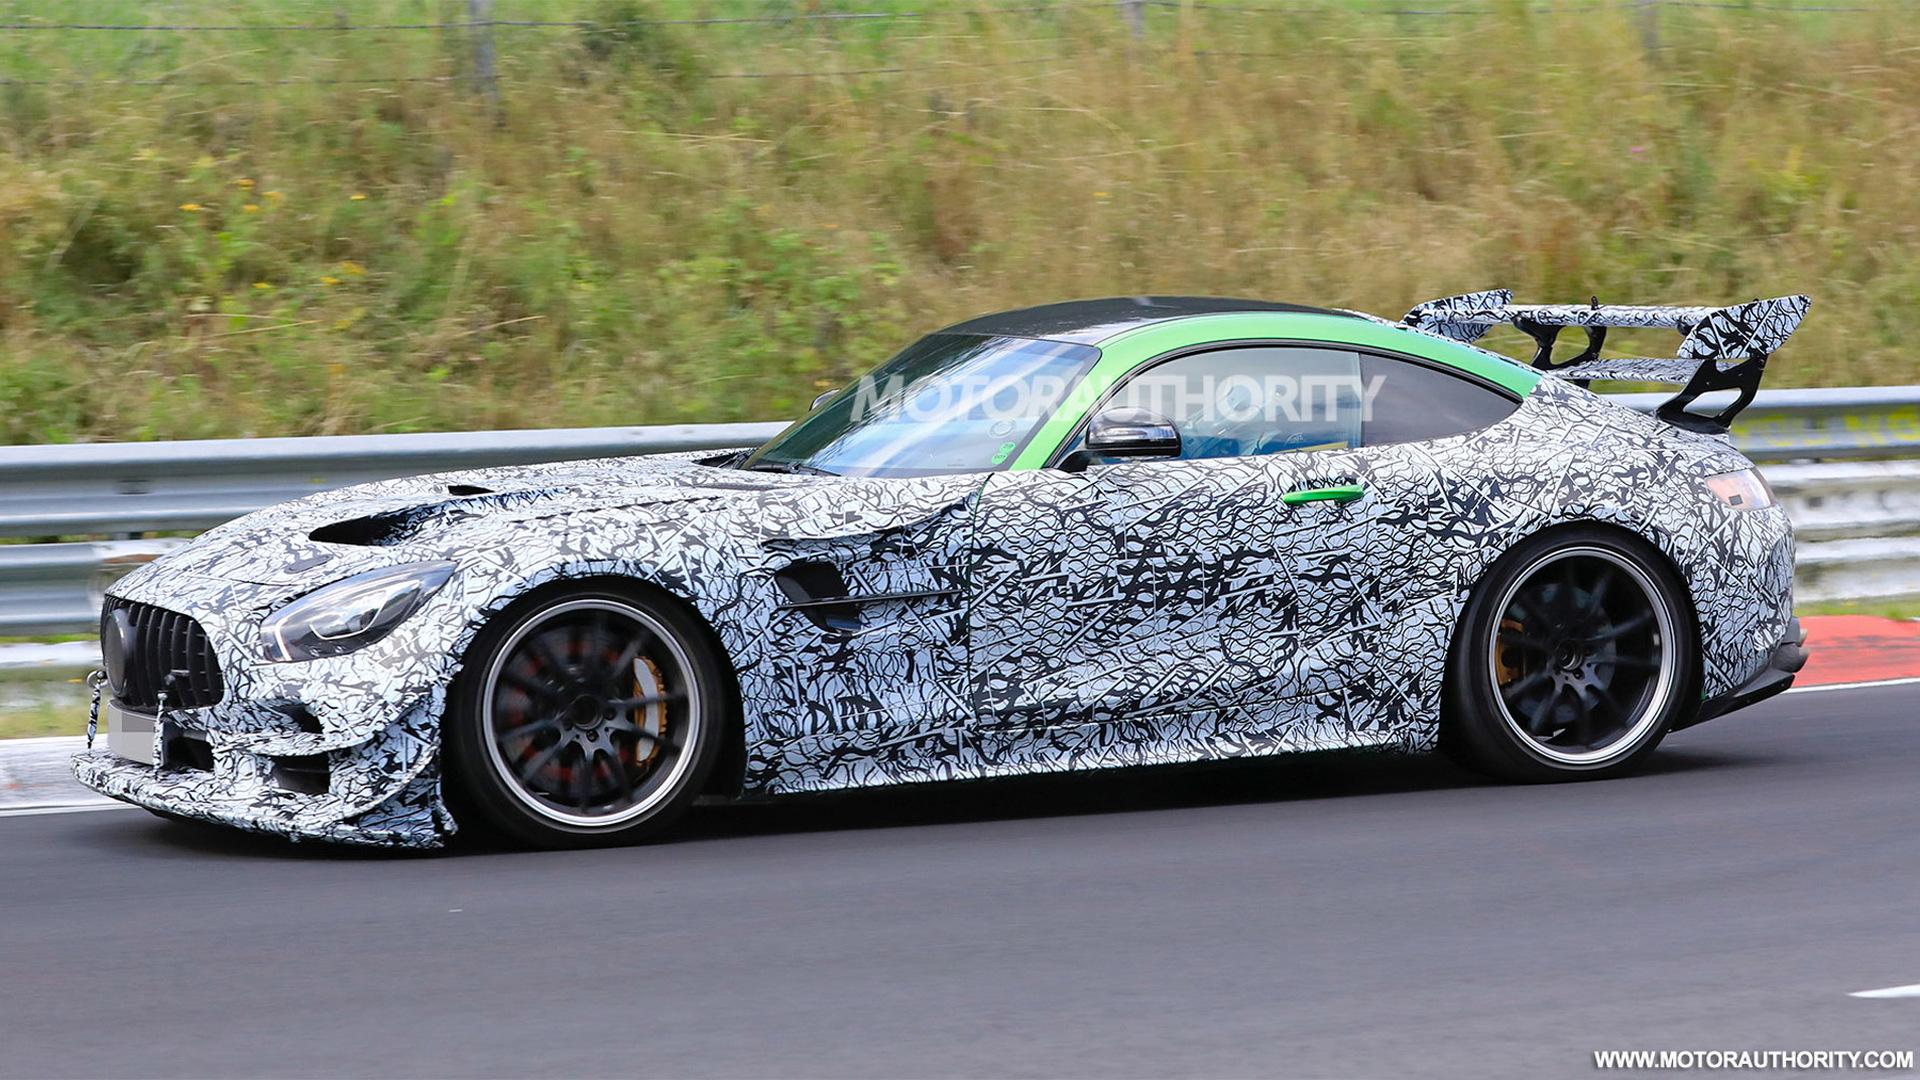 2021 Mercedes-AMG GT Black Series spy shots - Photo credit: S. Baldauf/SB-Medien